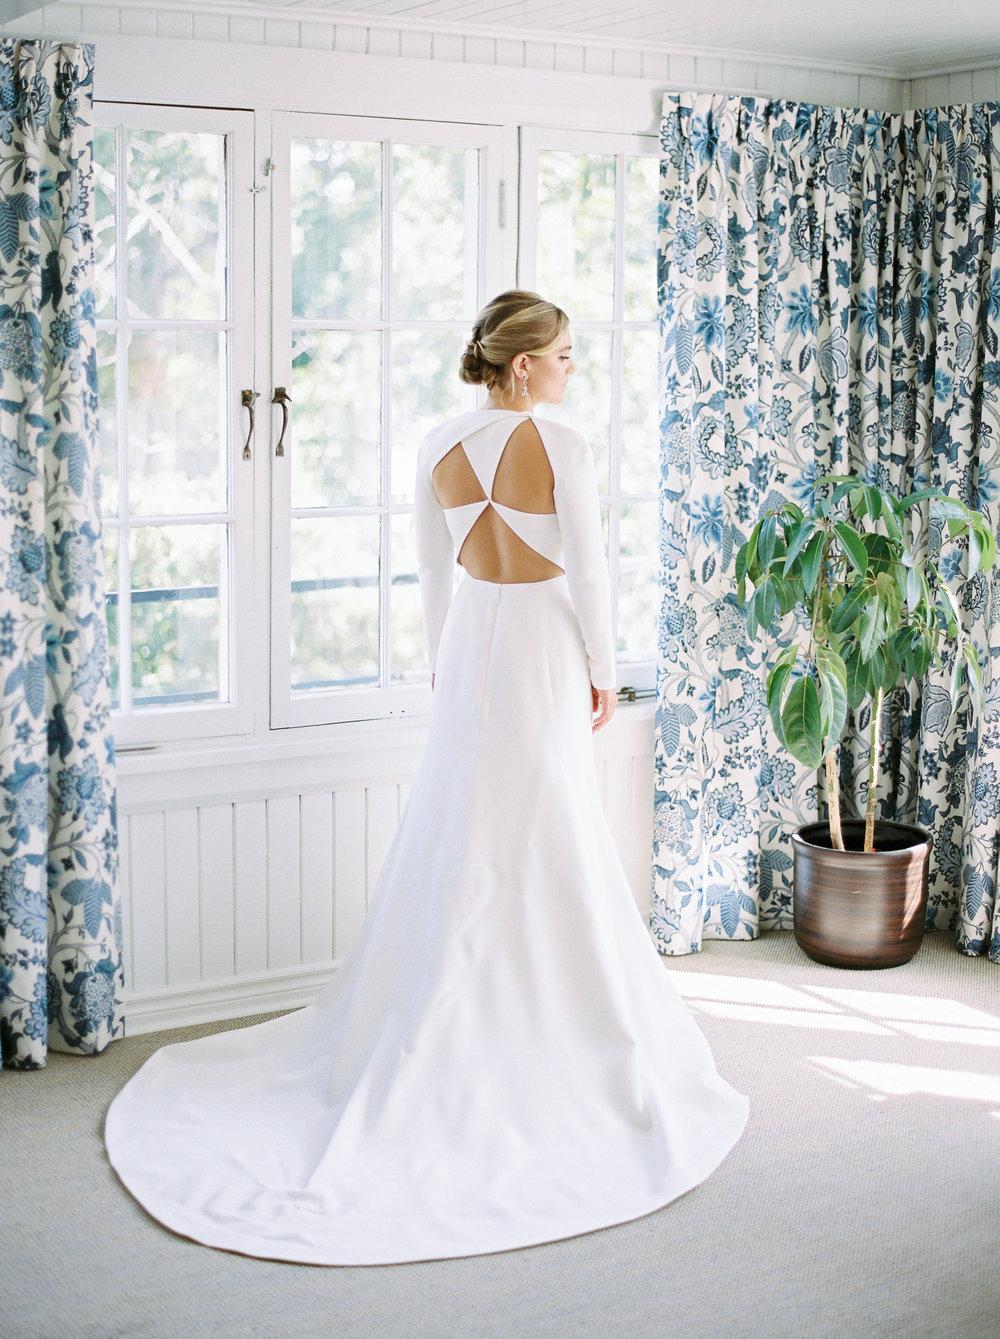 0059-Geneva-Ian-Wedding-Toronto Golf Club-When He Found Her-TorontoPhotographer.jpg